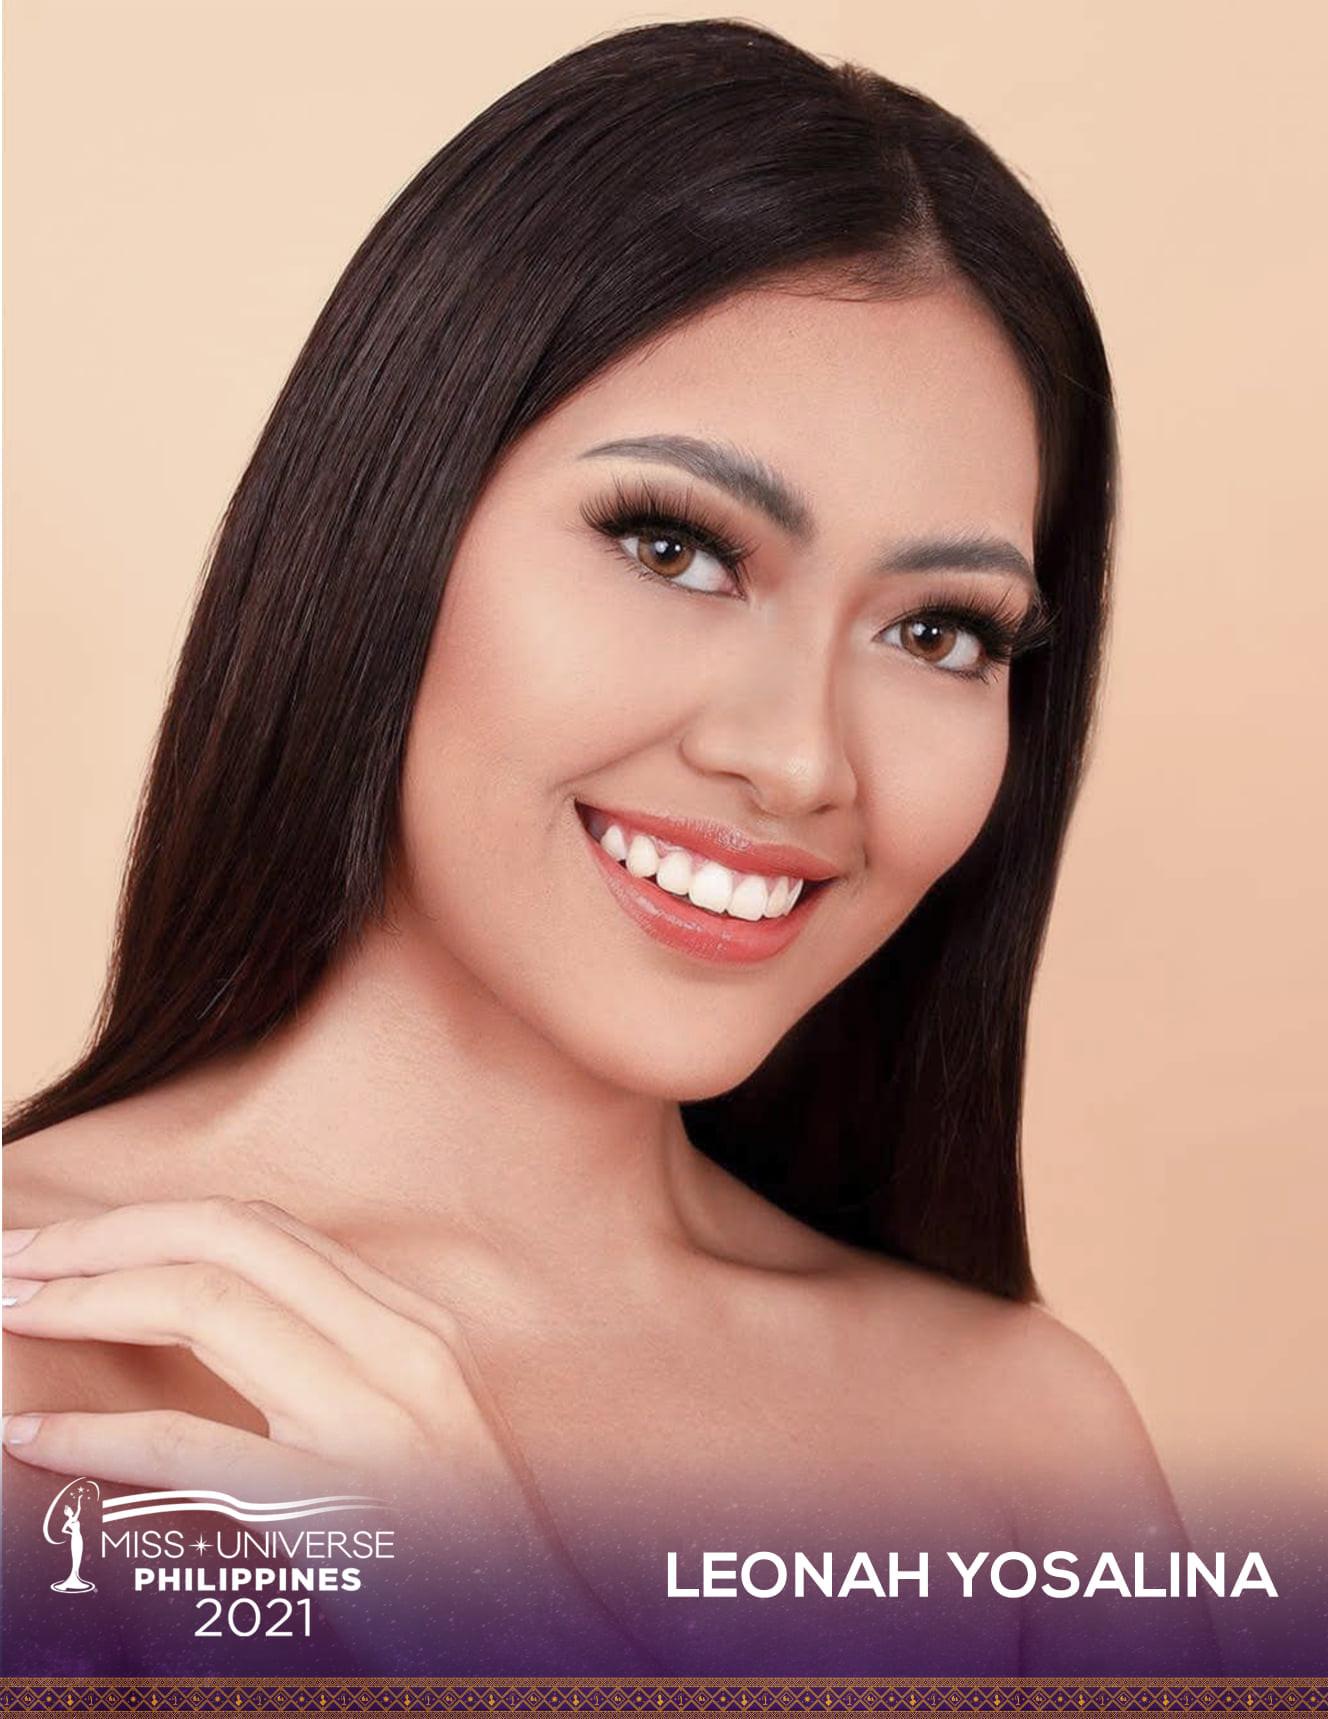 pre-candidatas a miss universe philippines 2021. - Página 6 AlcNhx